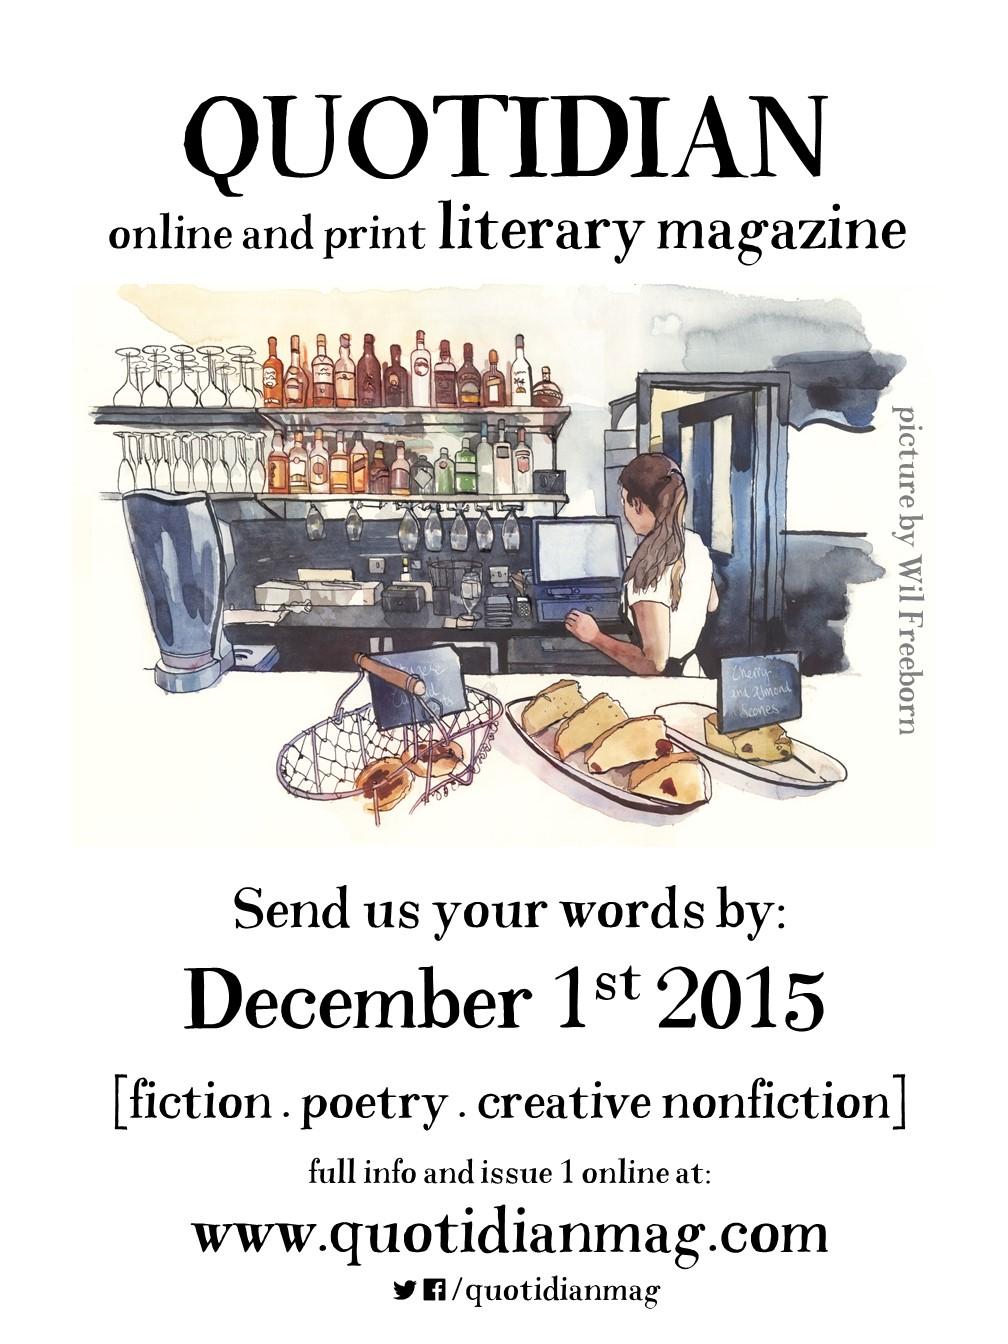 quotidian-literary-magazine-wil-freeborn